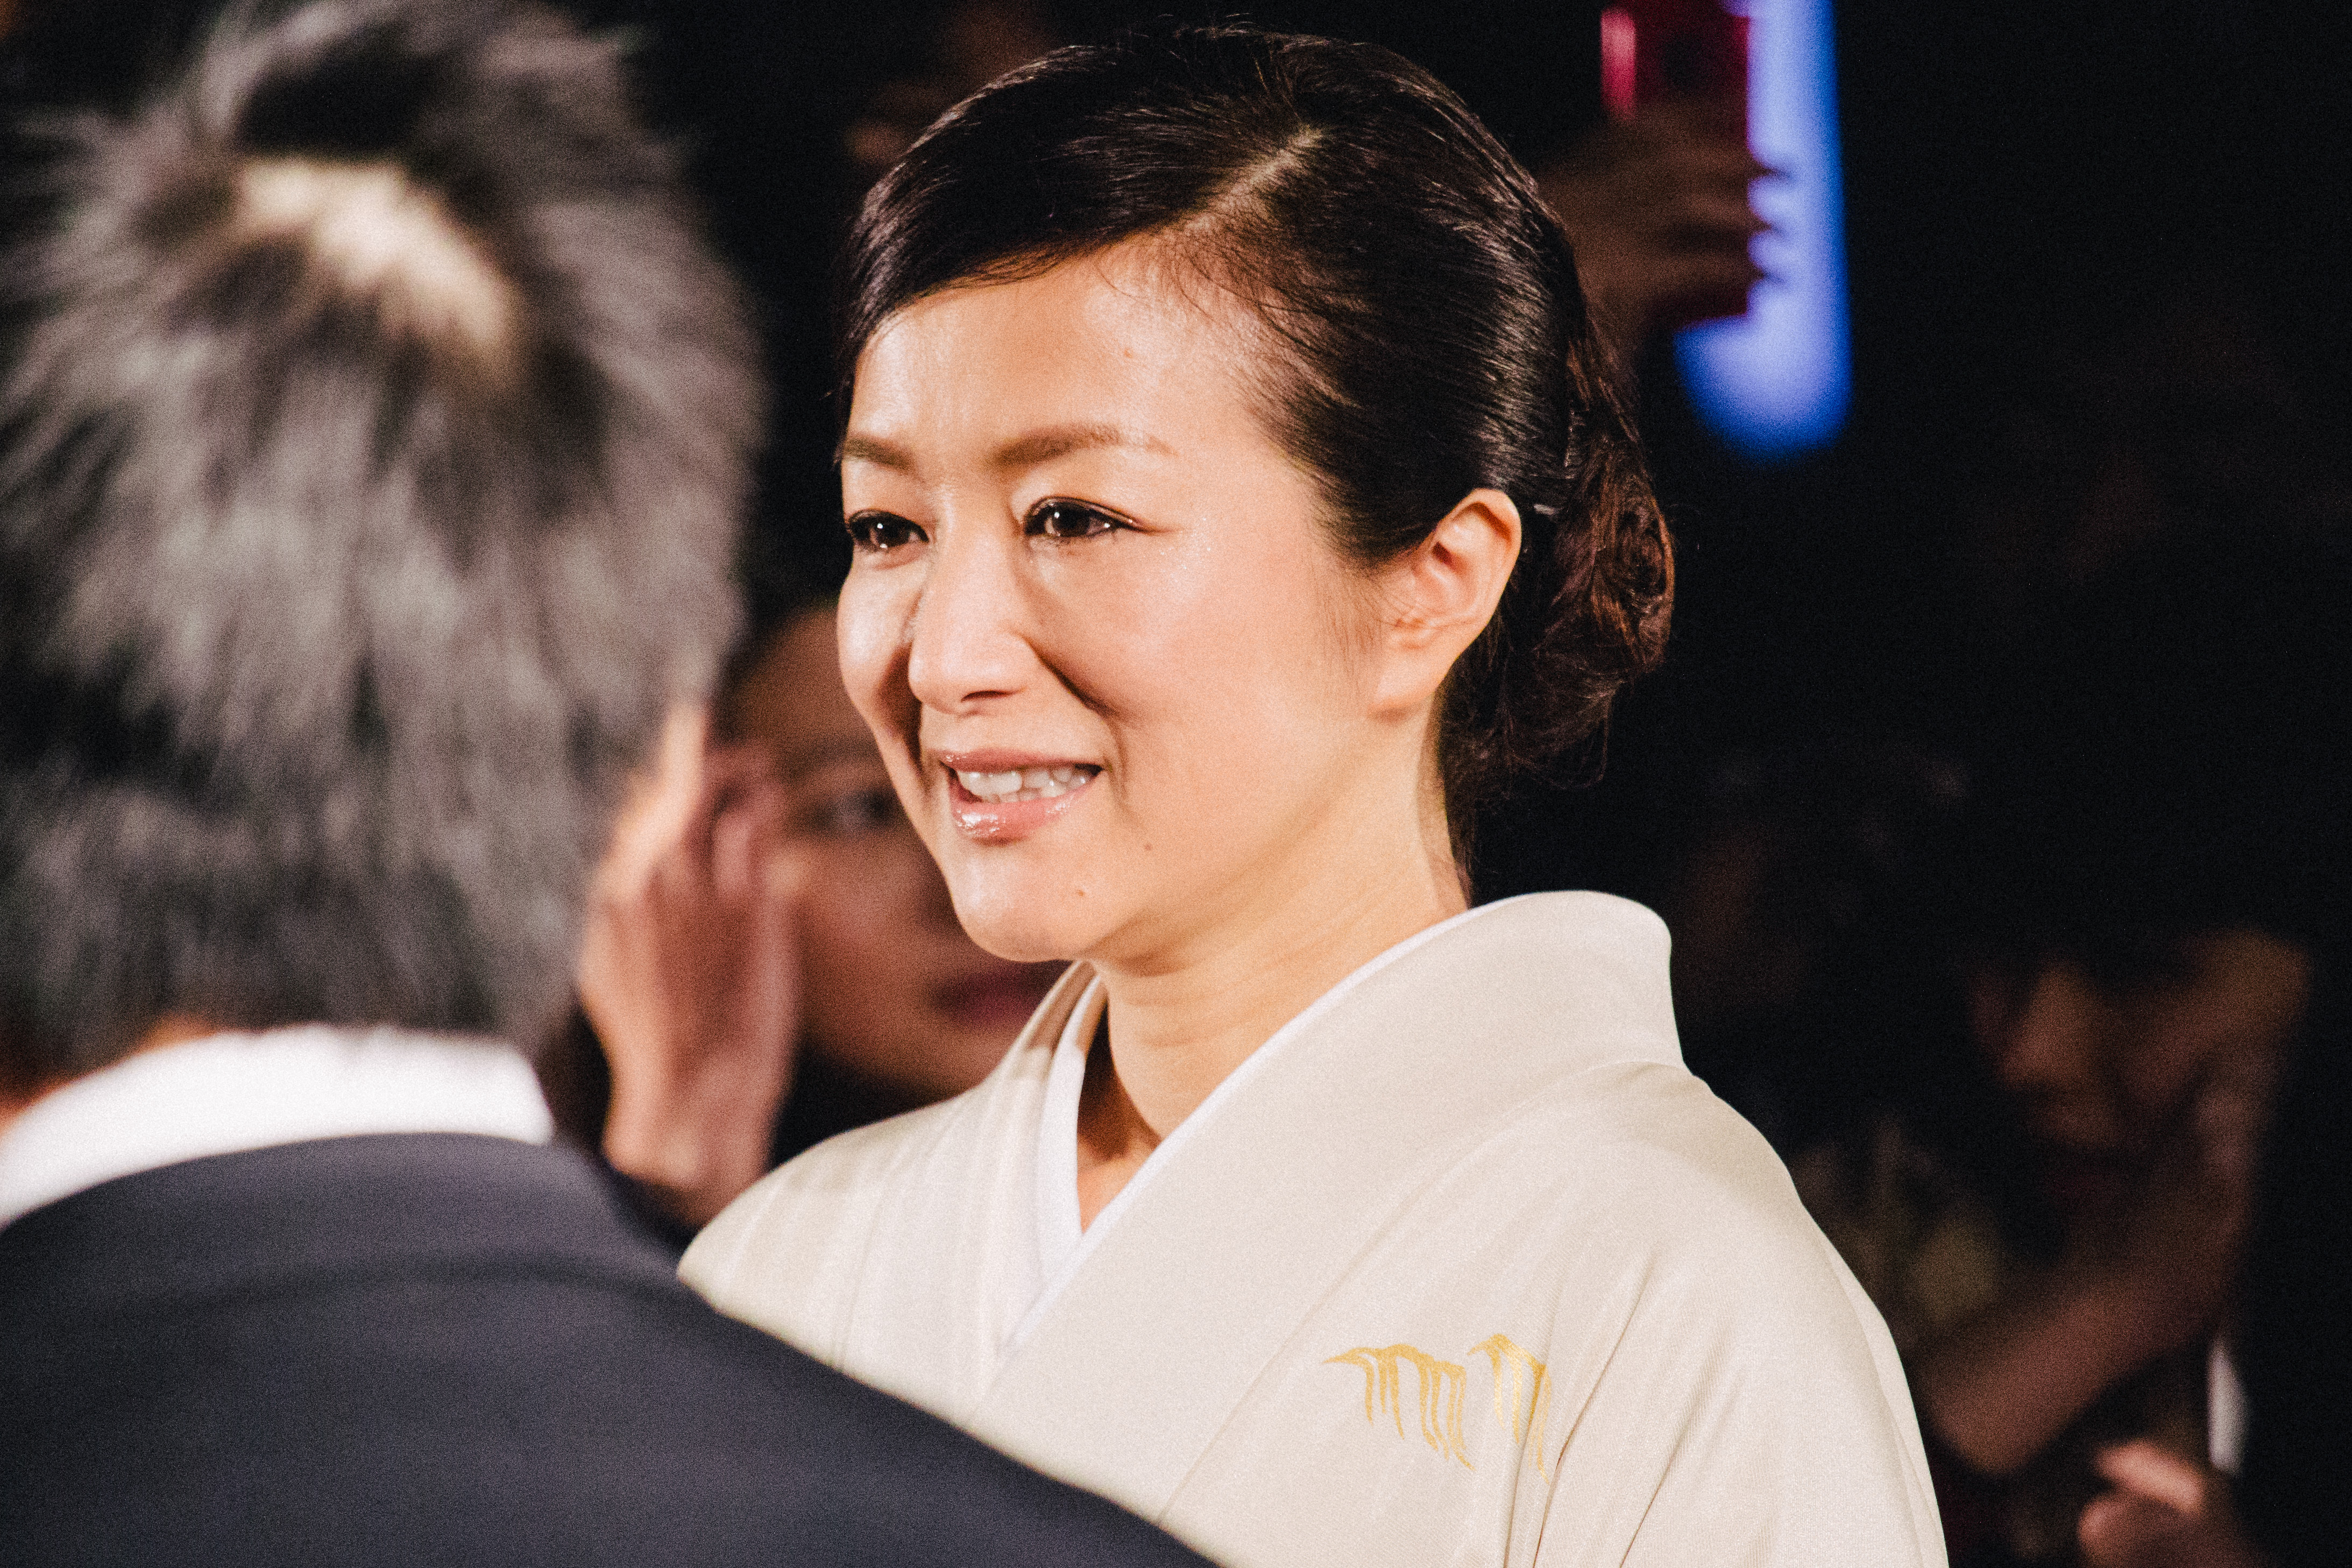 鈴木京香 , Wikipedia